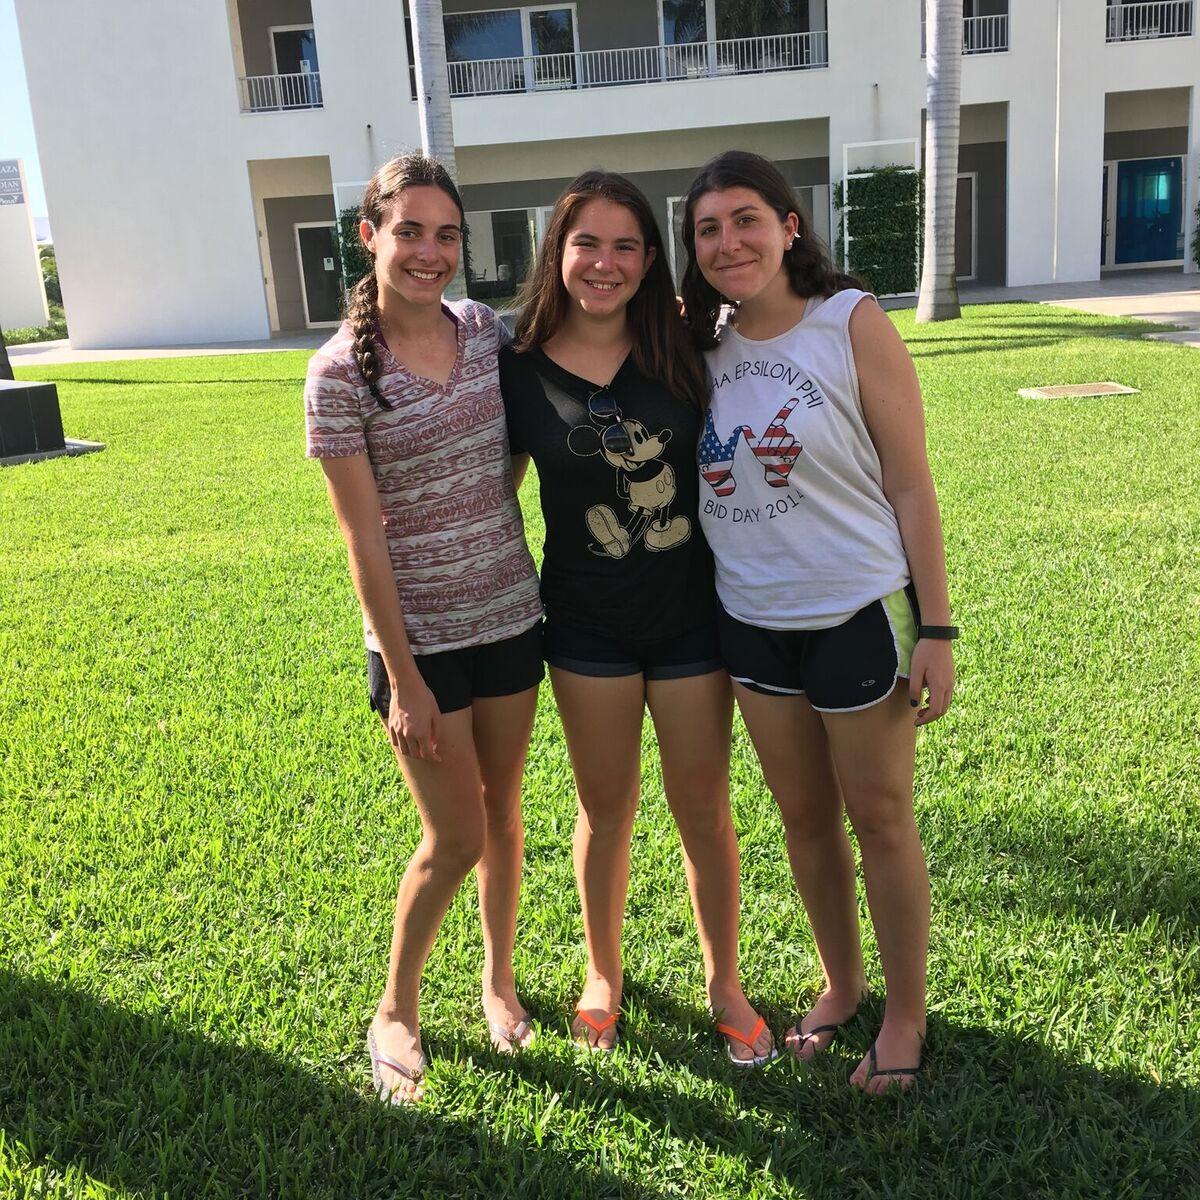 Marissa, Anna and Jane